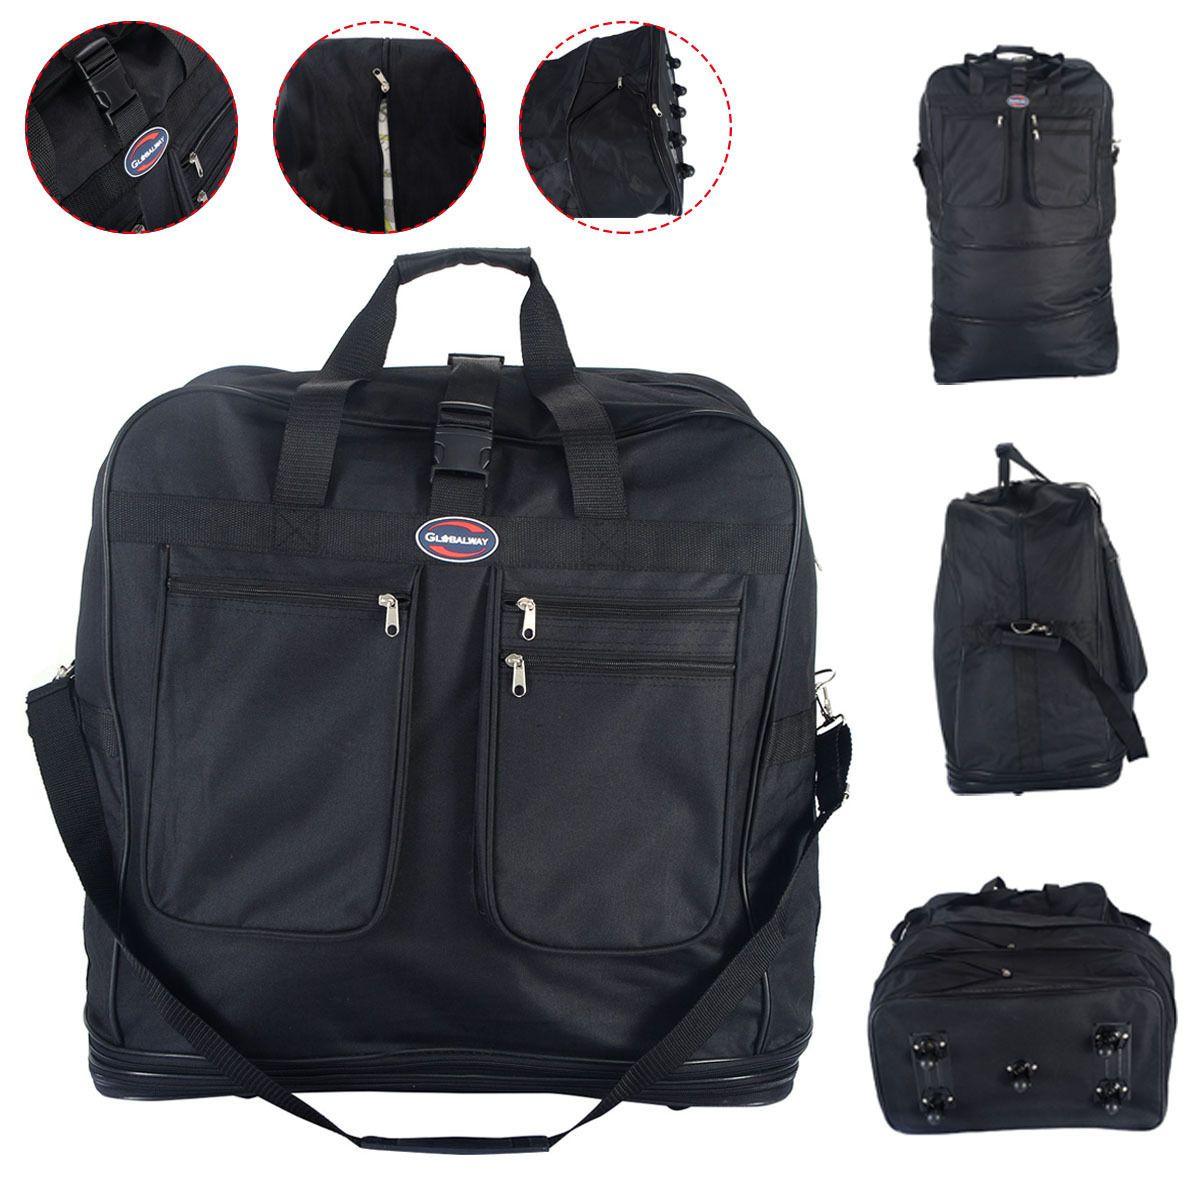 Purdue Gym Bags w//Shoe Pocket Broad Bay NCAA Purdue University Duffel Bag